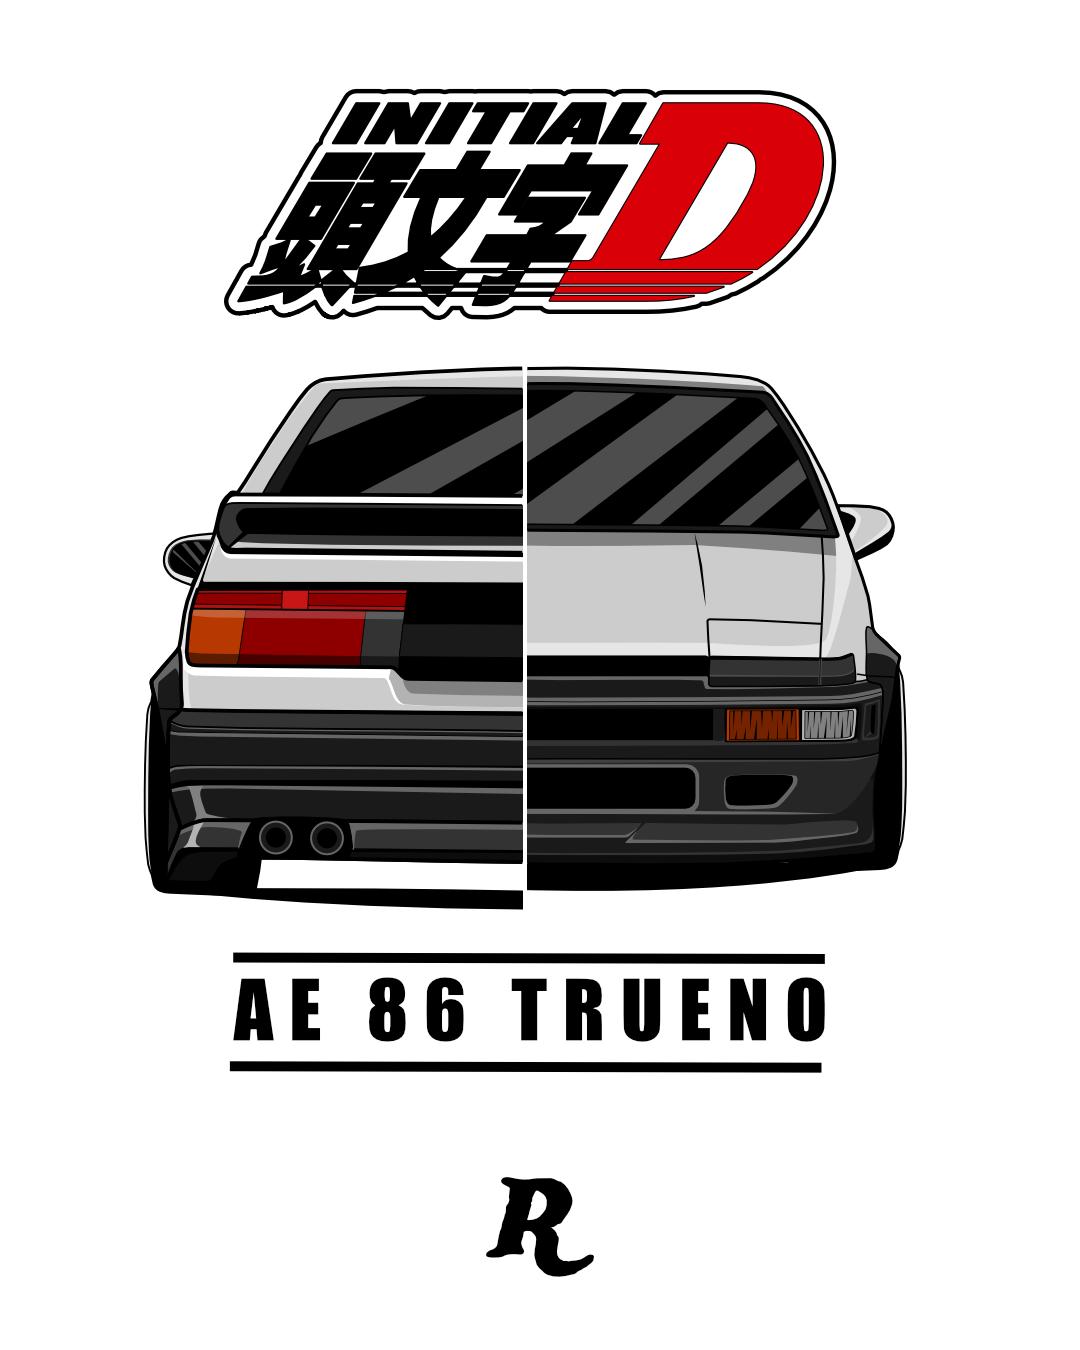 Pin Oleh Alejandro S Puga Di Car T Shirt Mobil Logo Keren Kartun